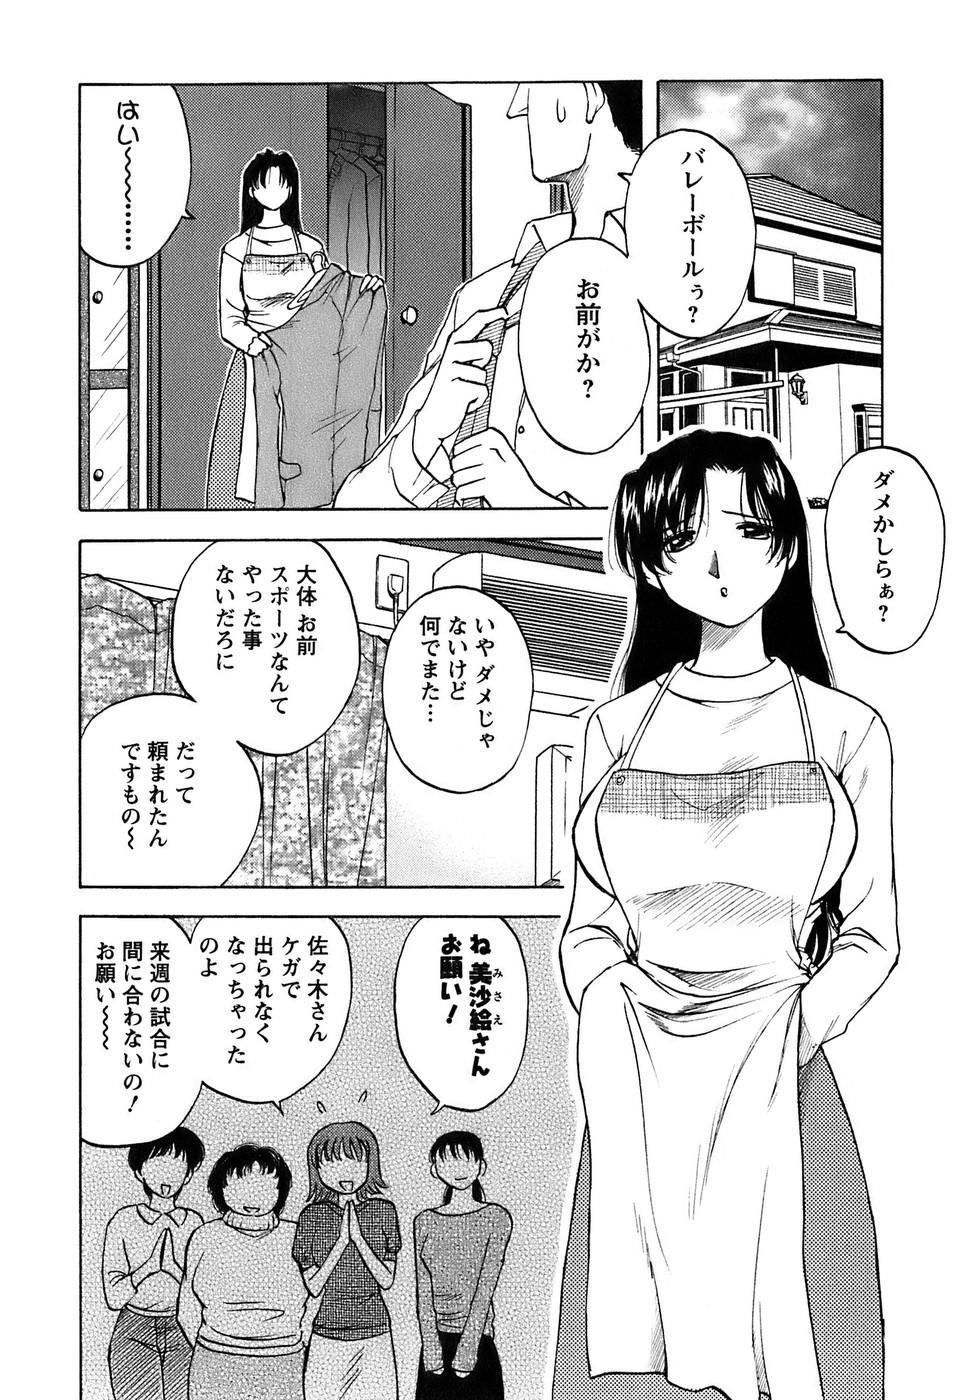 Okusan Volley - Madam Volleyball 6